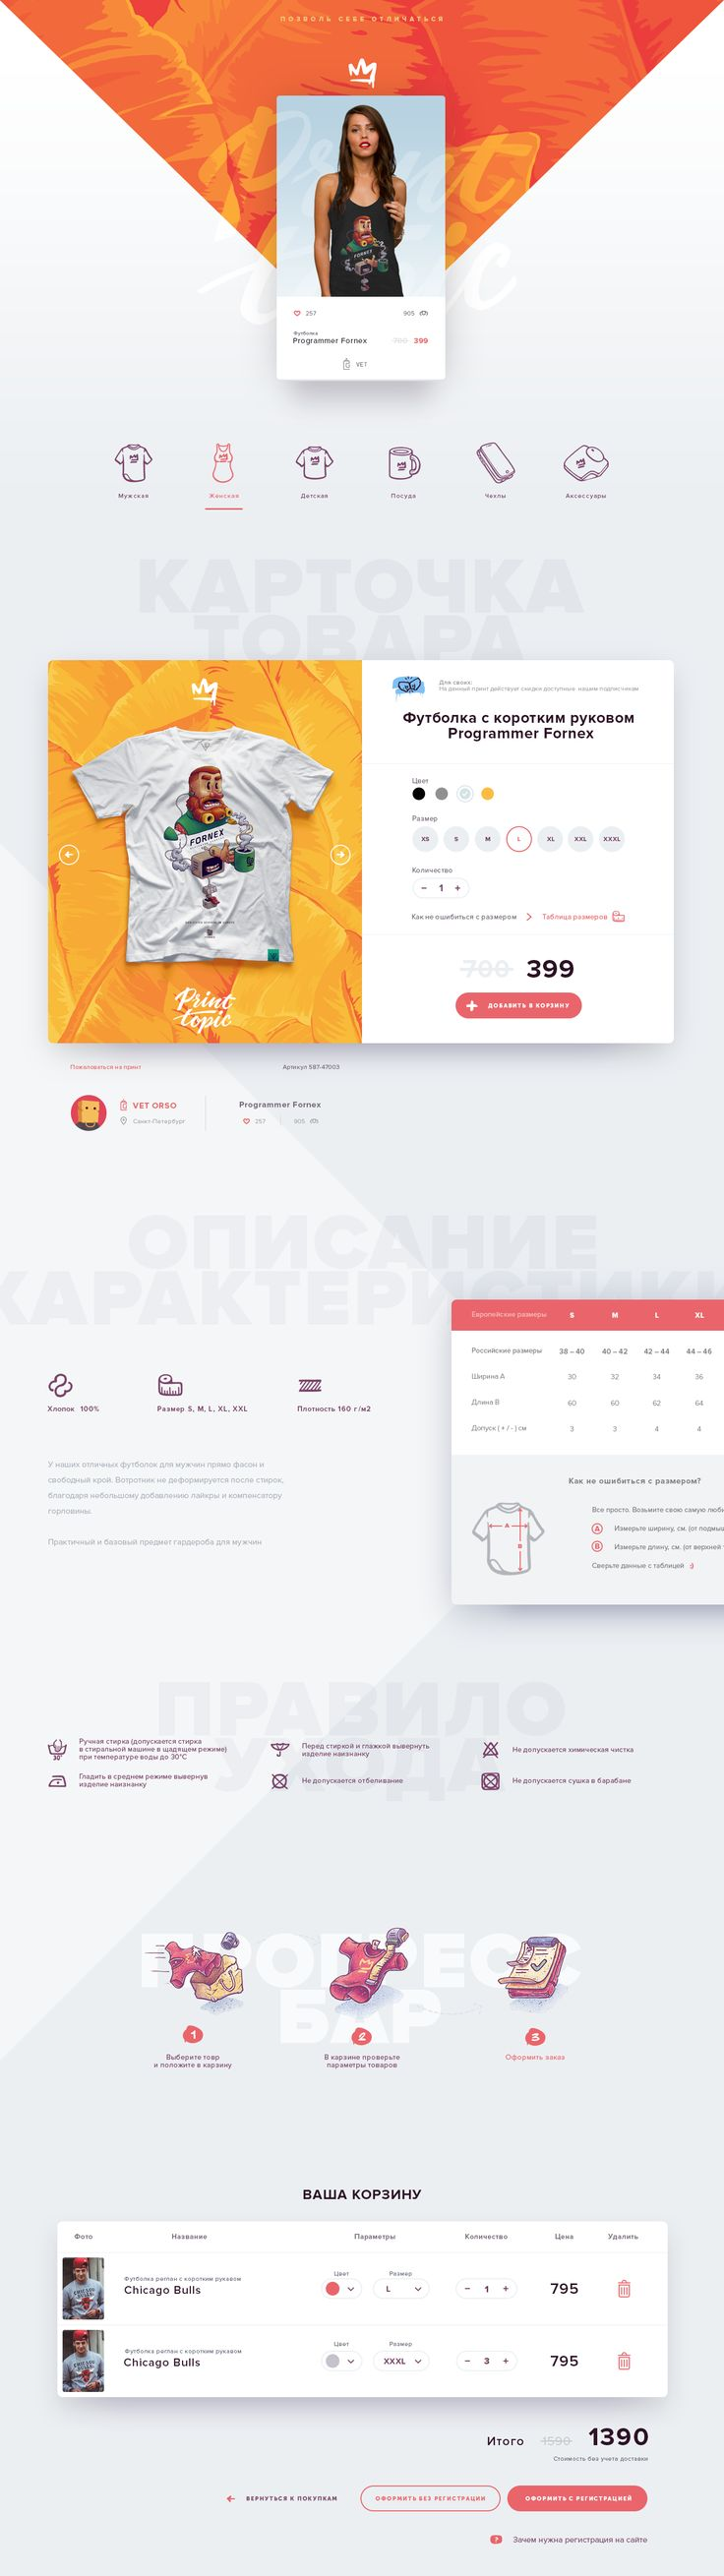 Print Topic Shop | UI on Behance